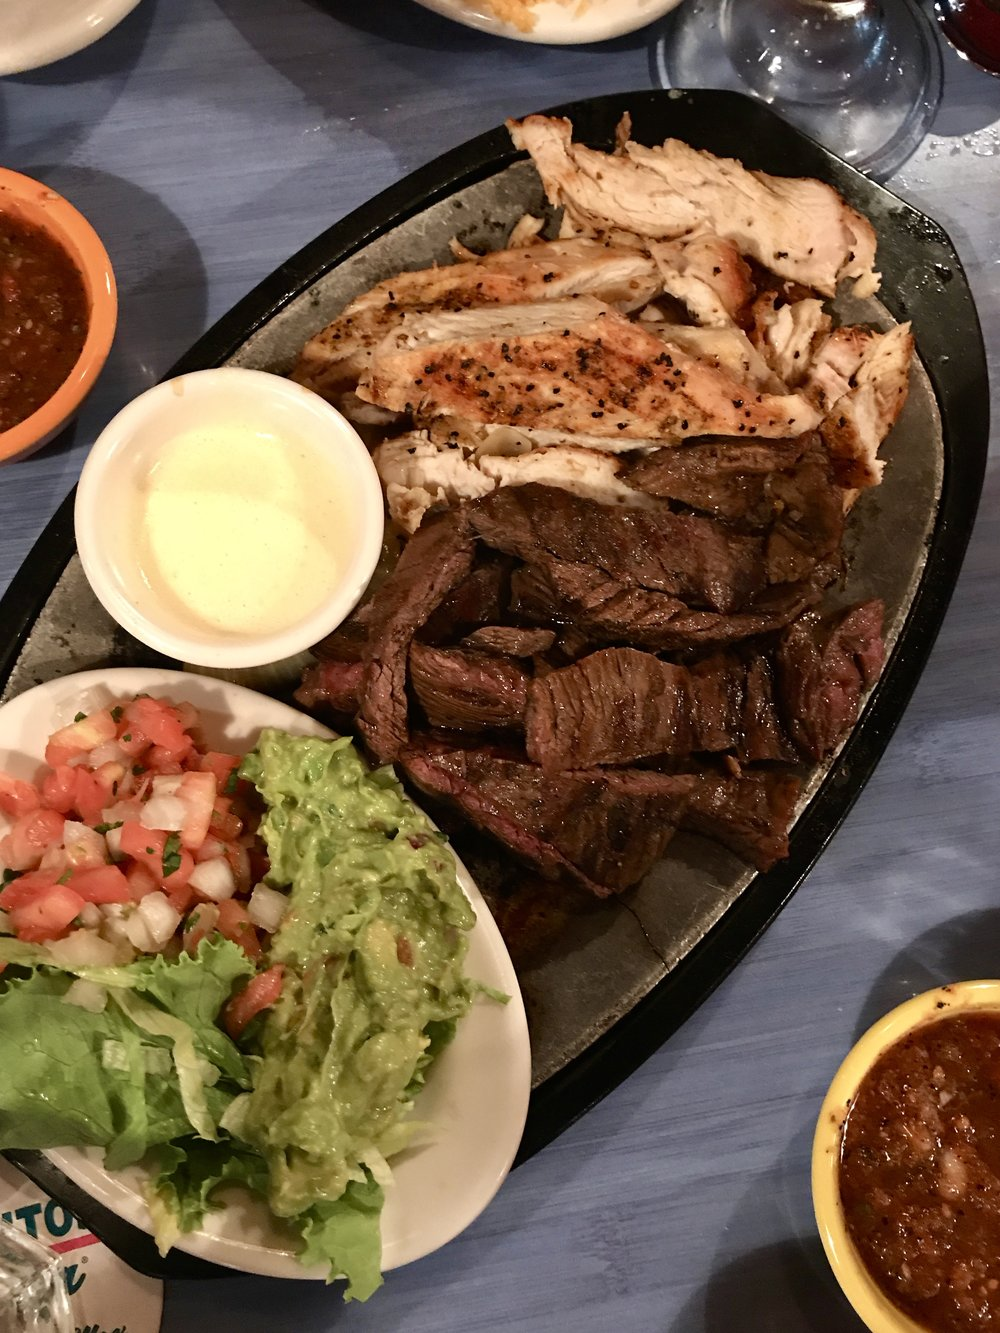 Foodie Travel Austin, Texas I'd Eat That Food